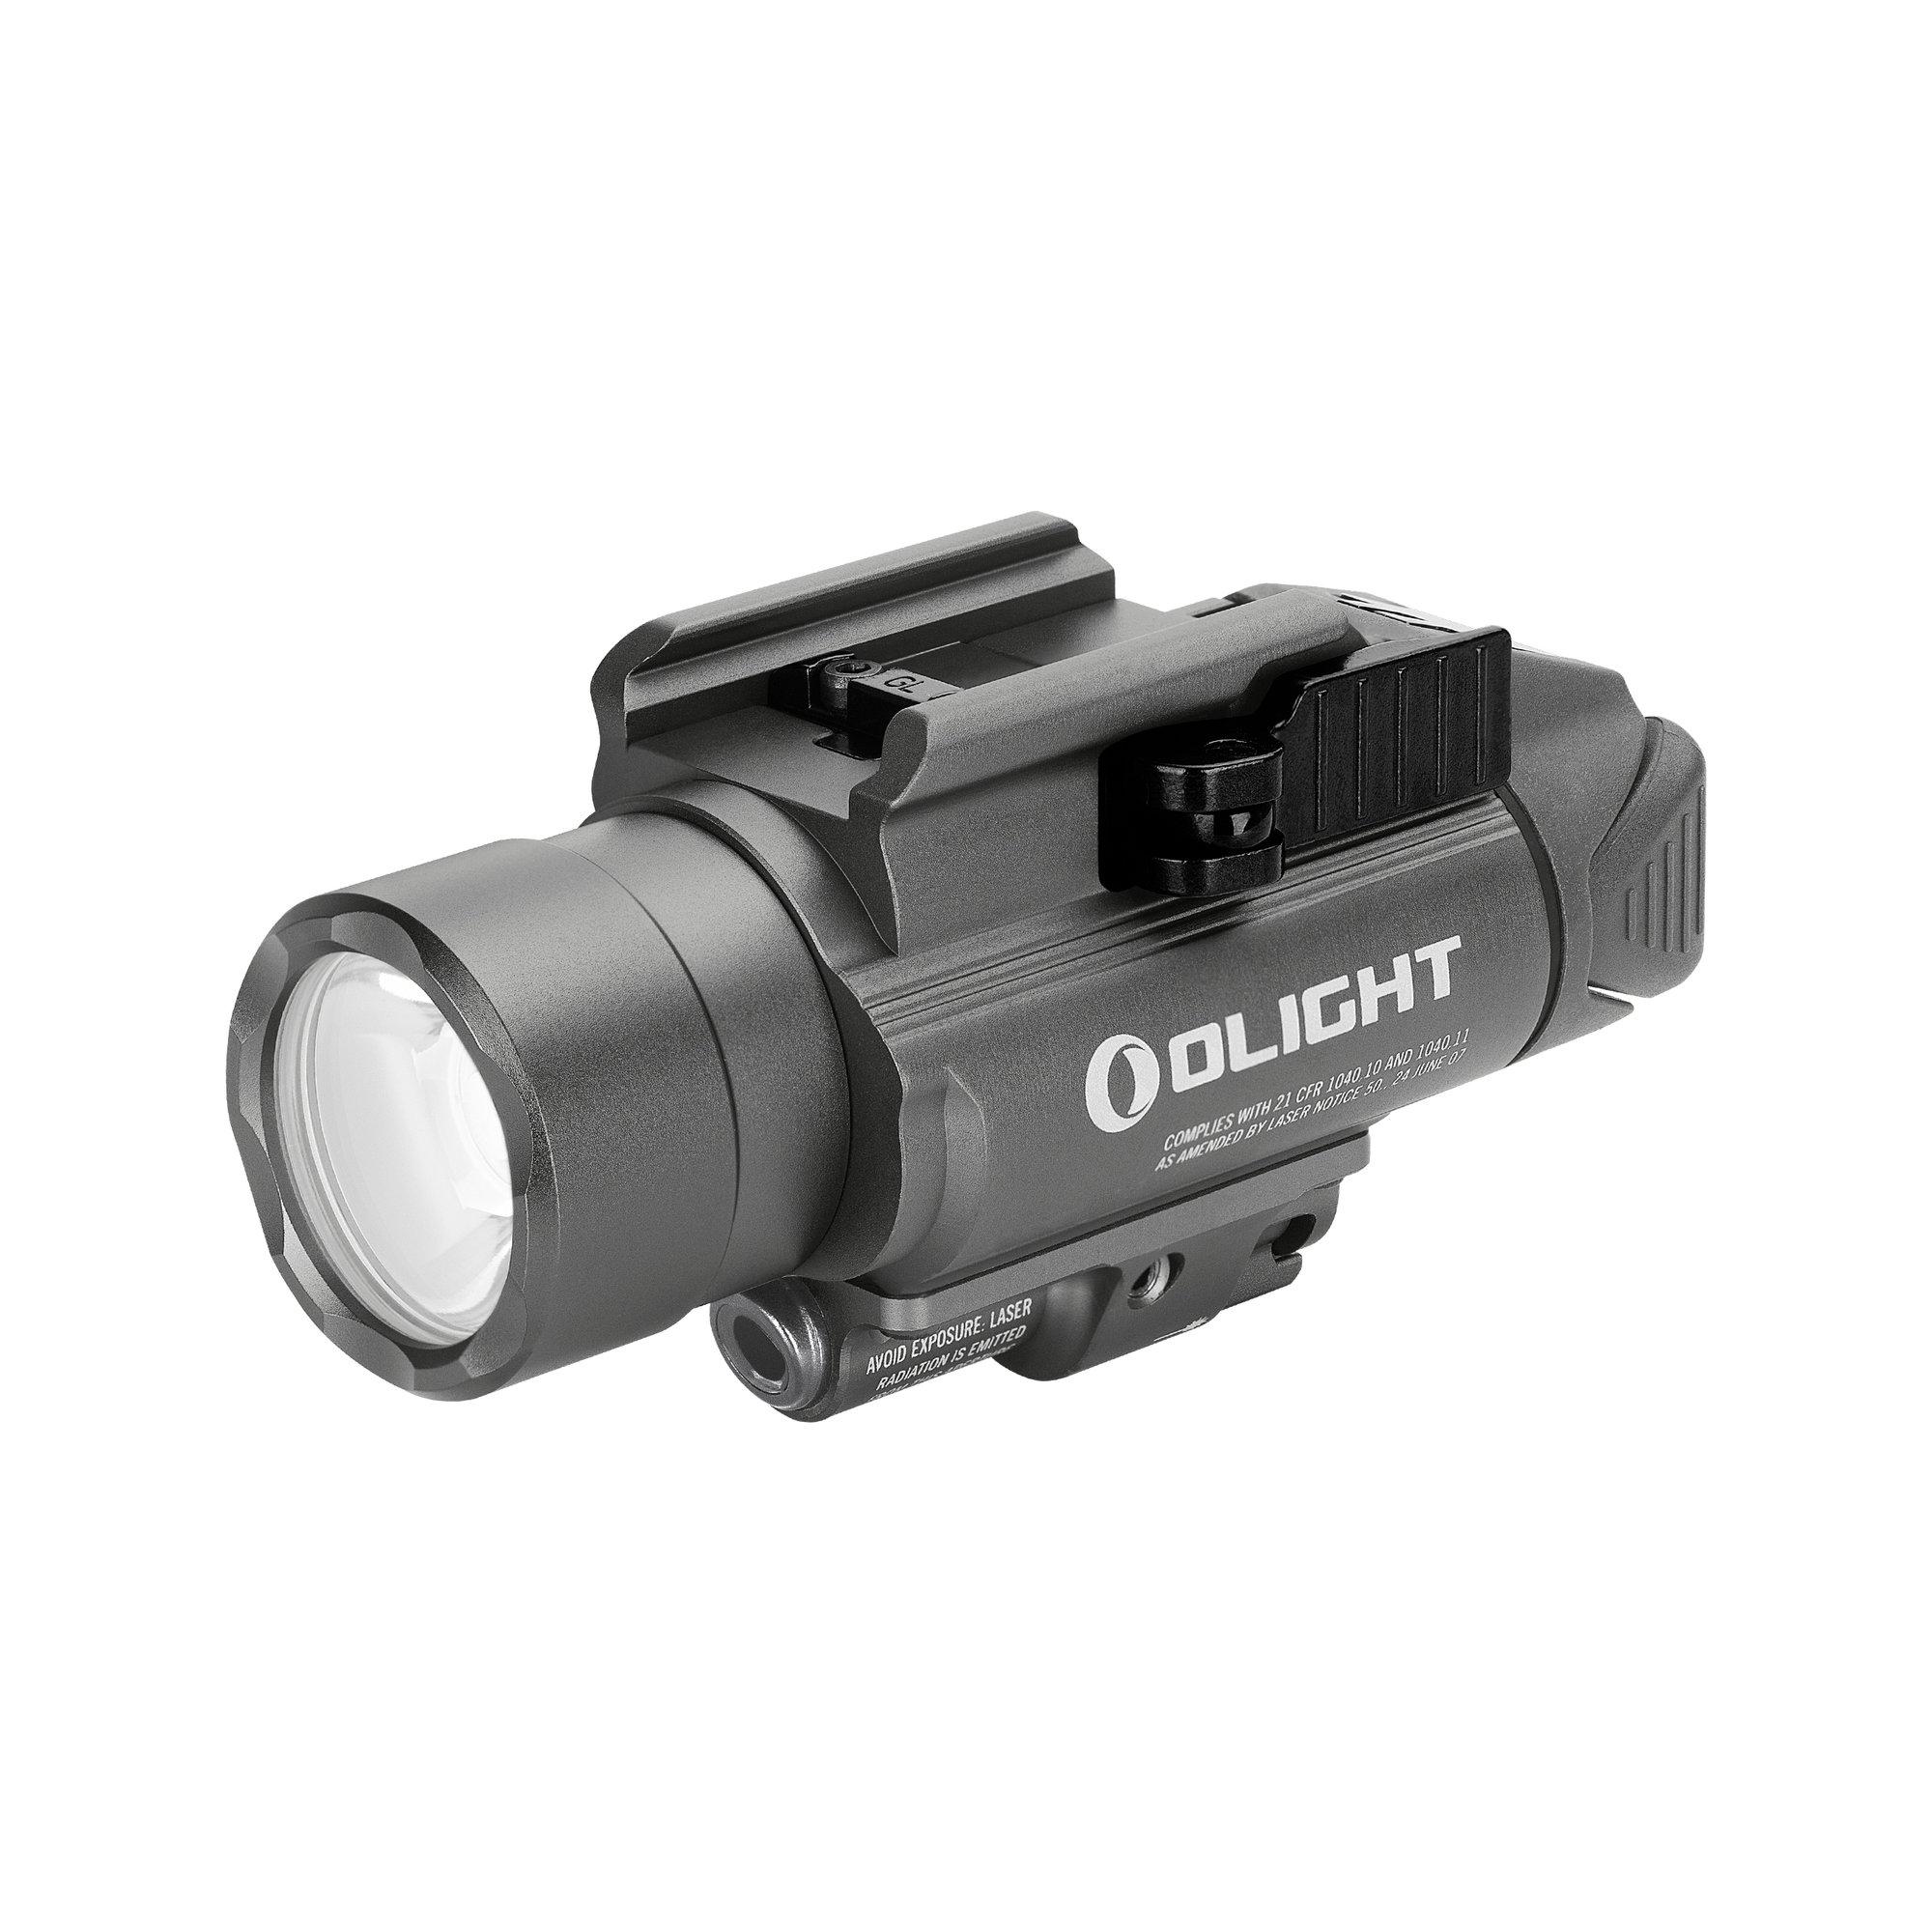 Svetlo na zbraň Olight BALDR Pro 1350 lm - zelený laser gunmetal grey limitovaná edícia